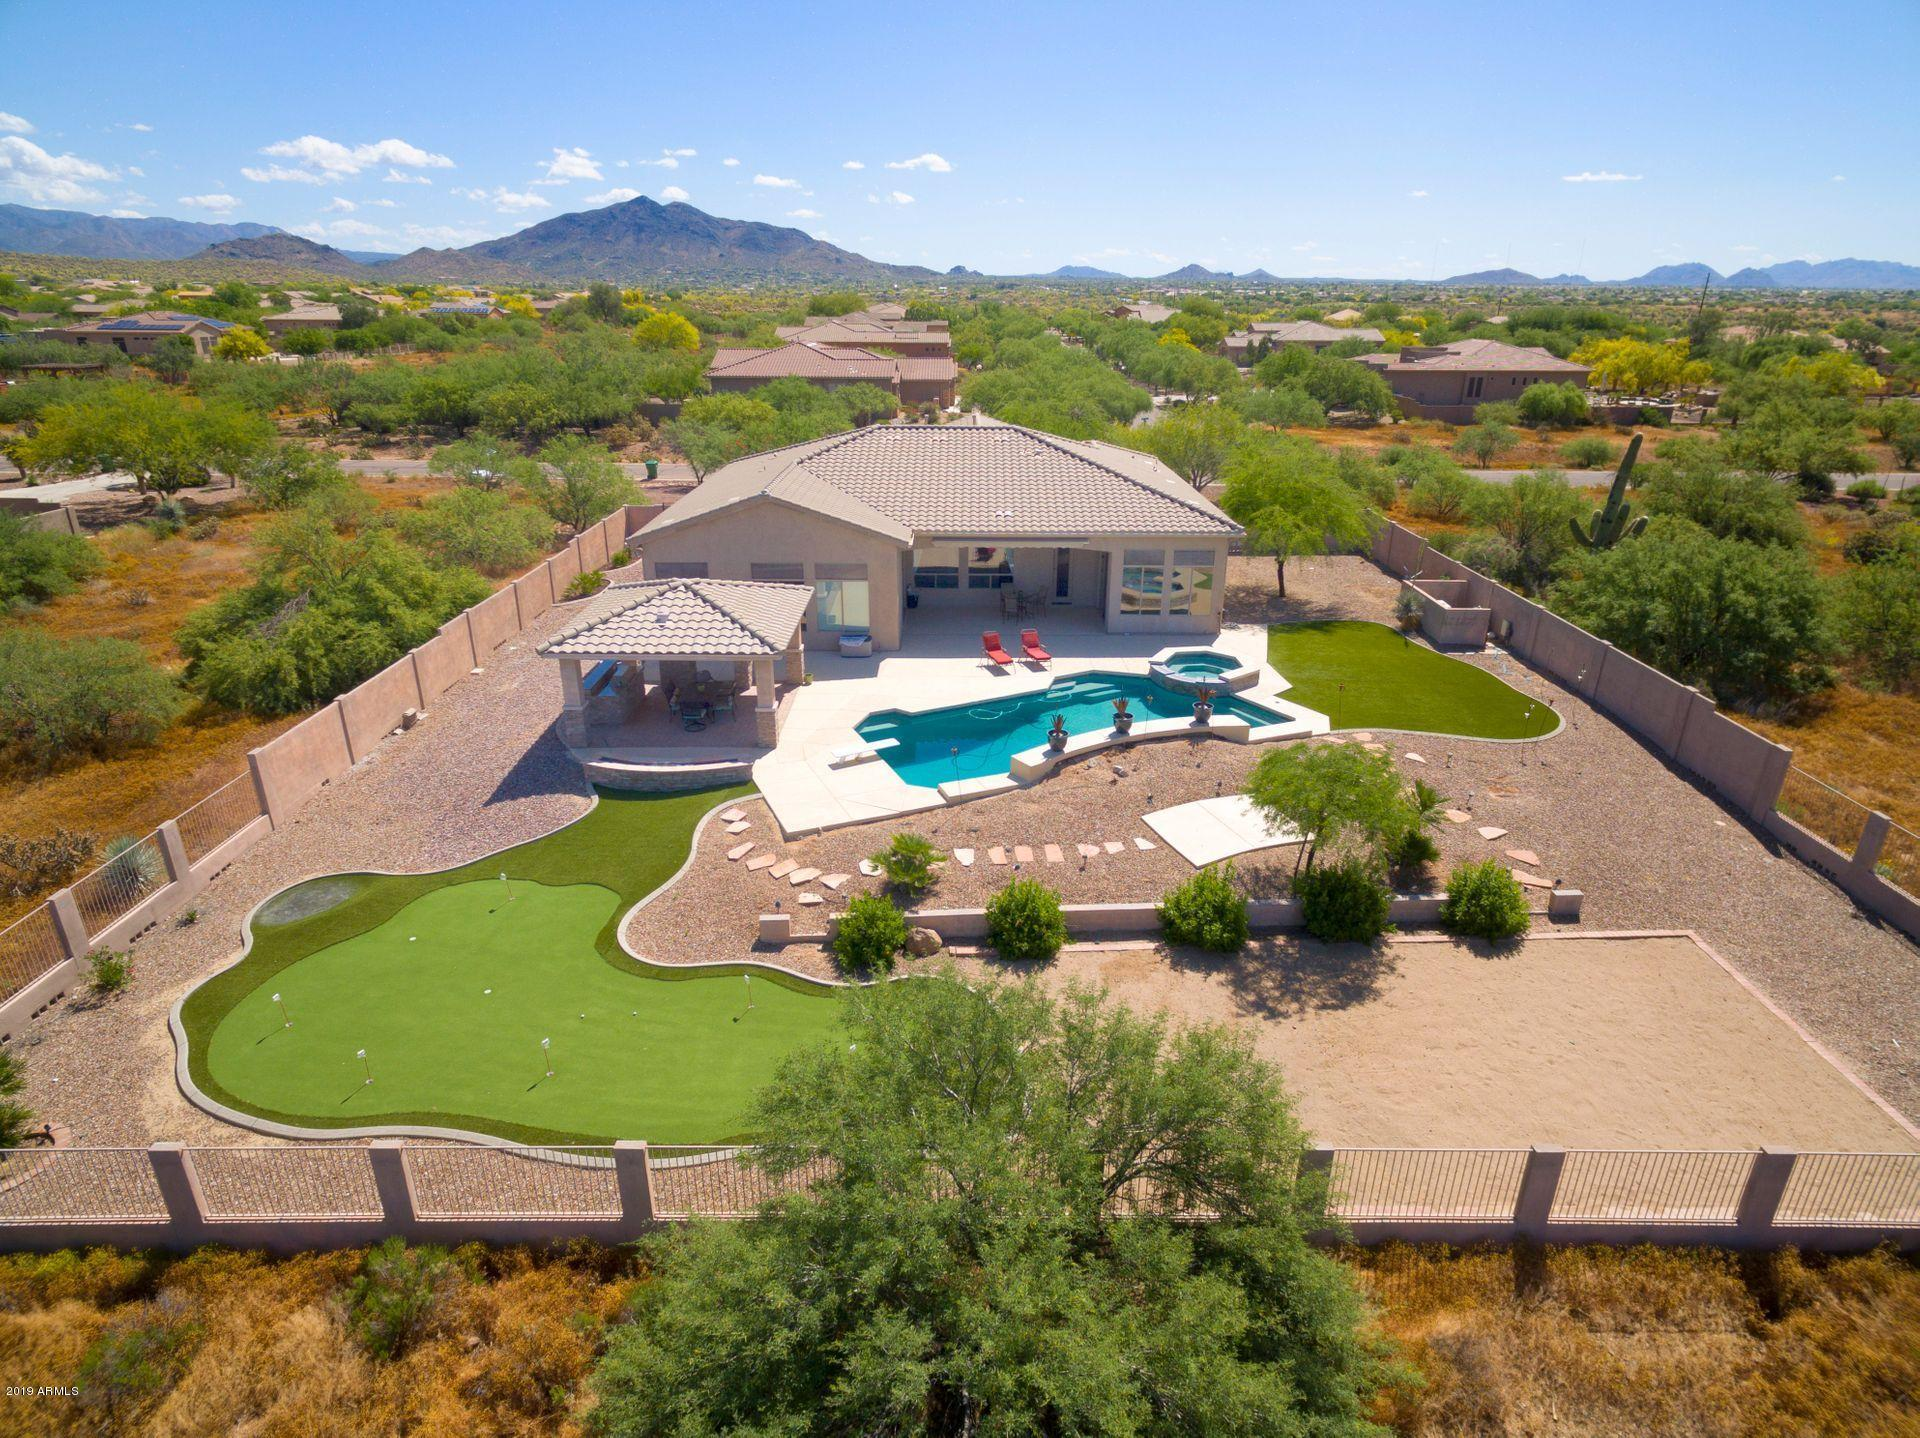 MLS 5922148 34830 N 36TH Place, Cave Creek, AZ 85331 Cave Creek AZ Golf